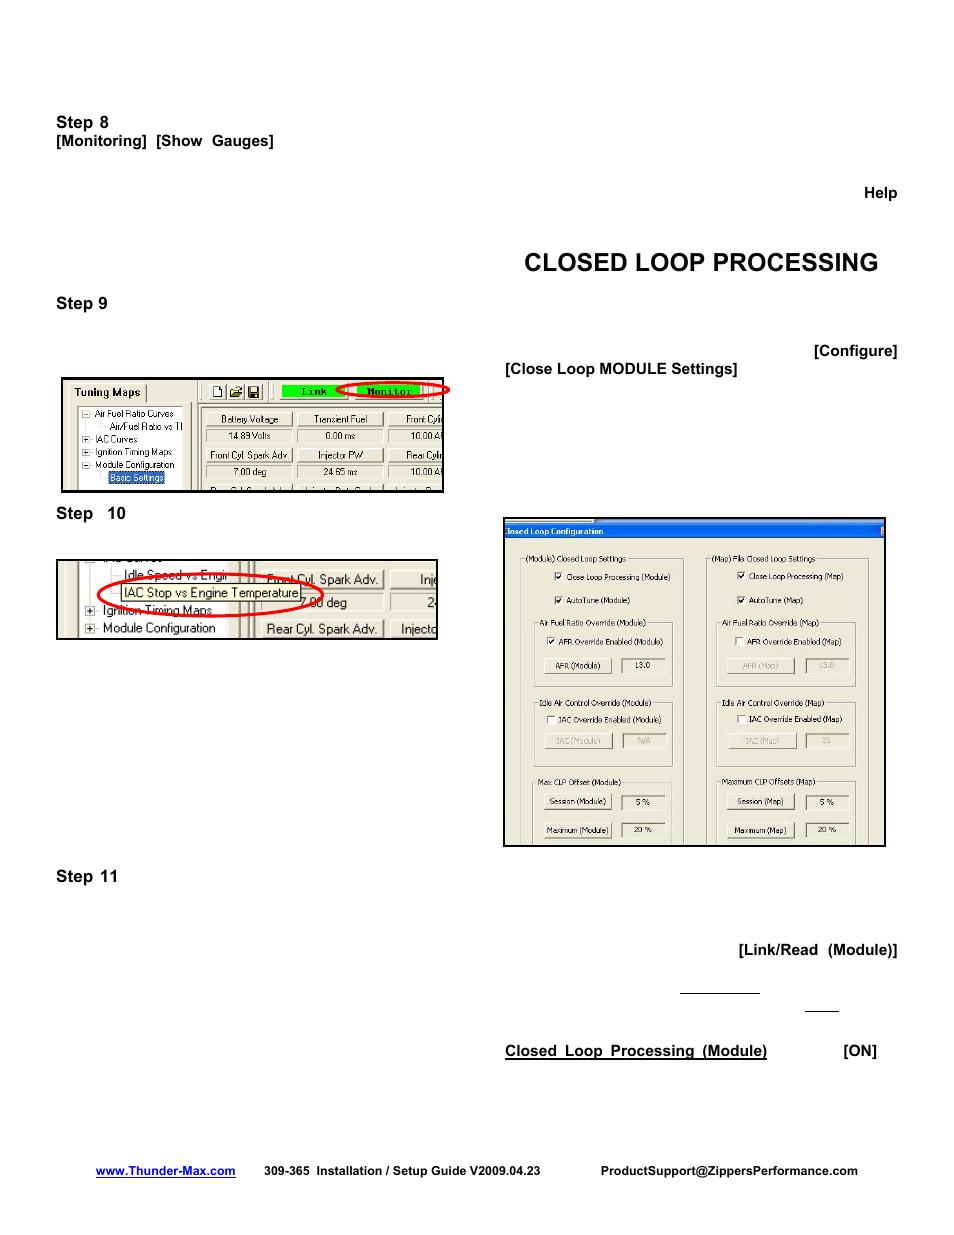 Closed loop processing | Zipper Mowers Thunder-Max 309-365 User Manual |  Page